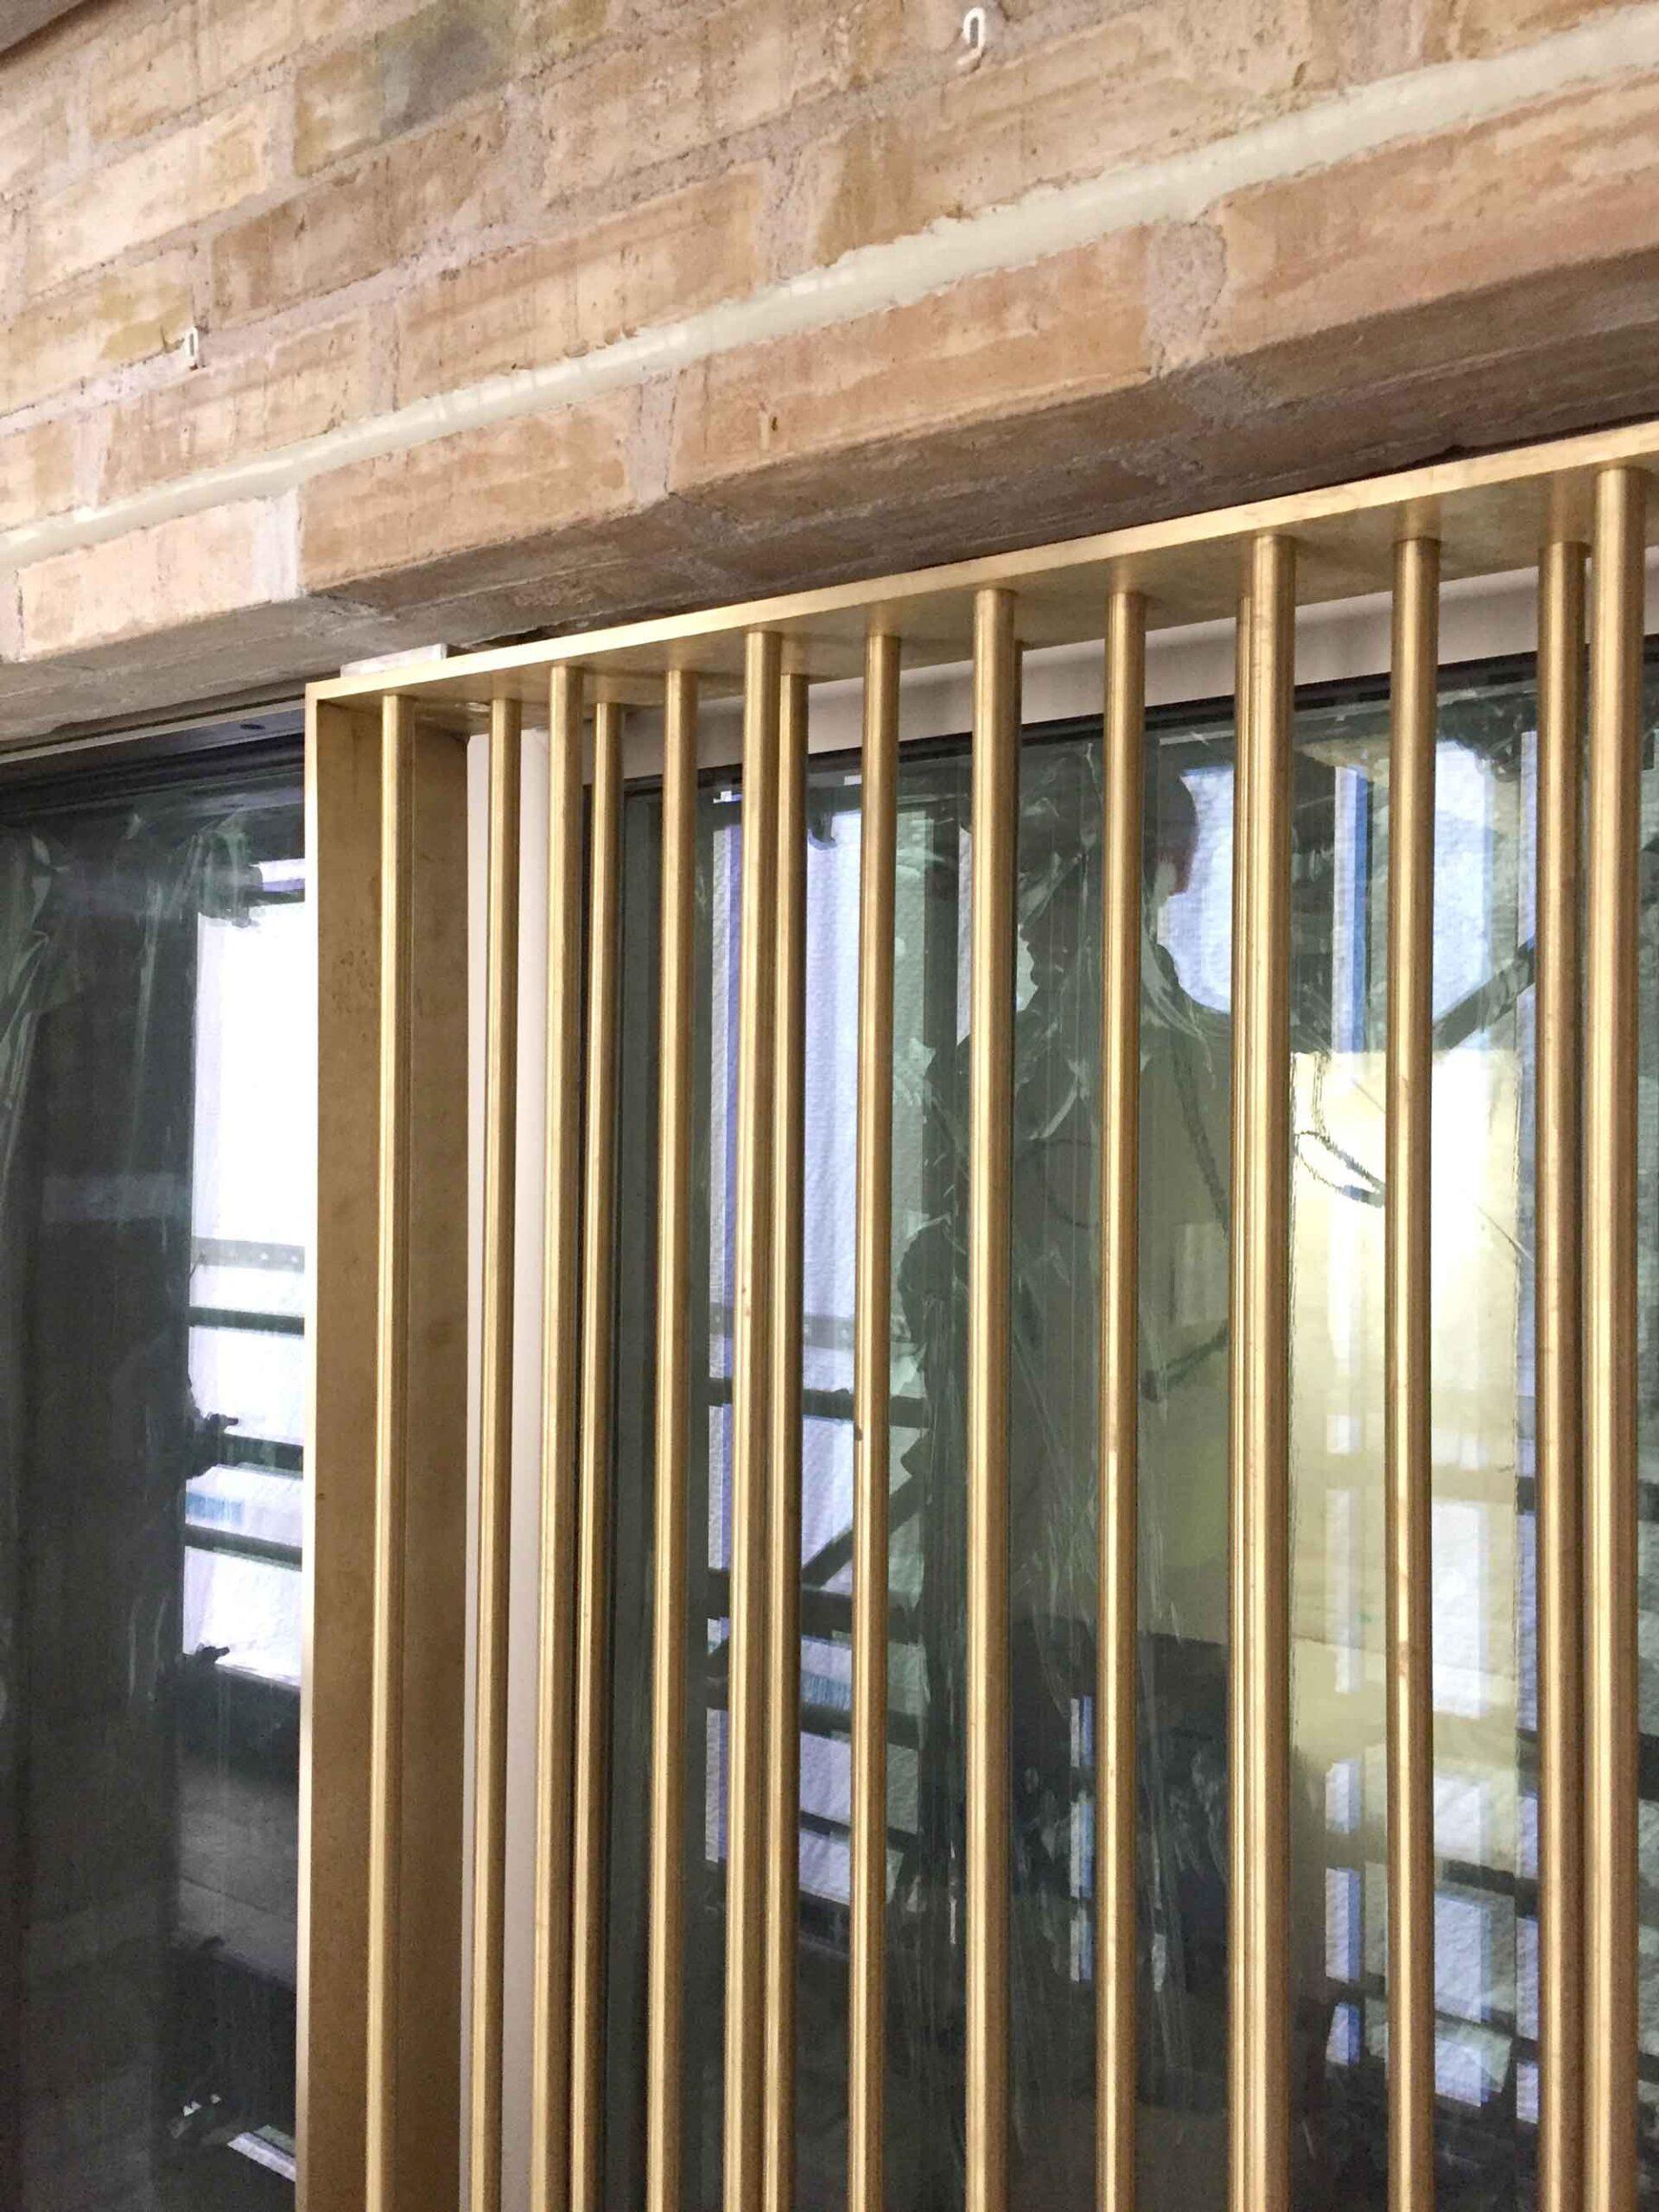 westminster-fire-station-openstudio-architects-window-screen-details